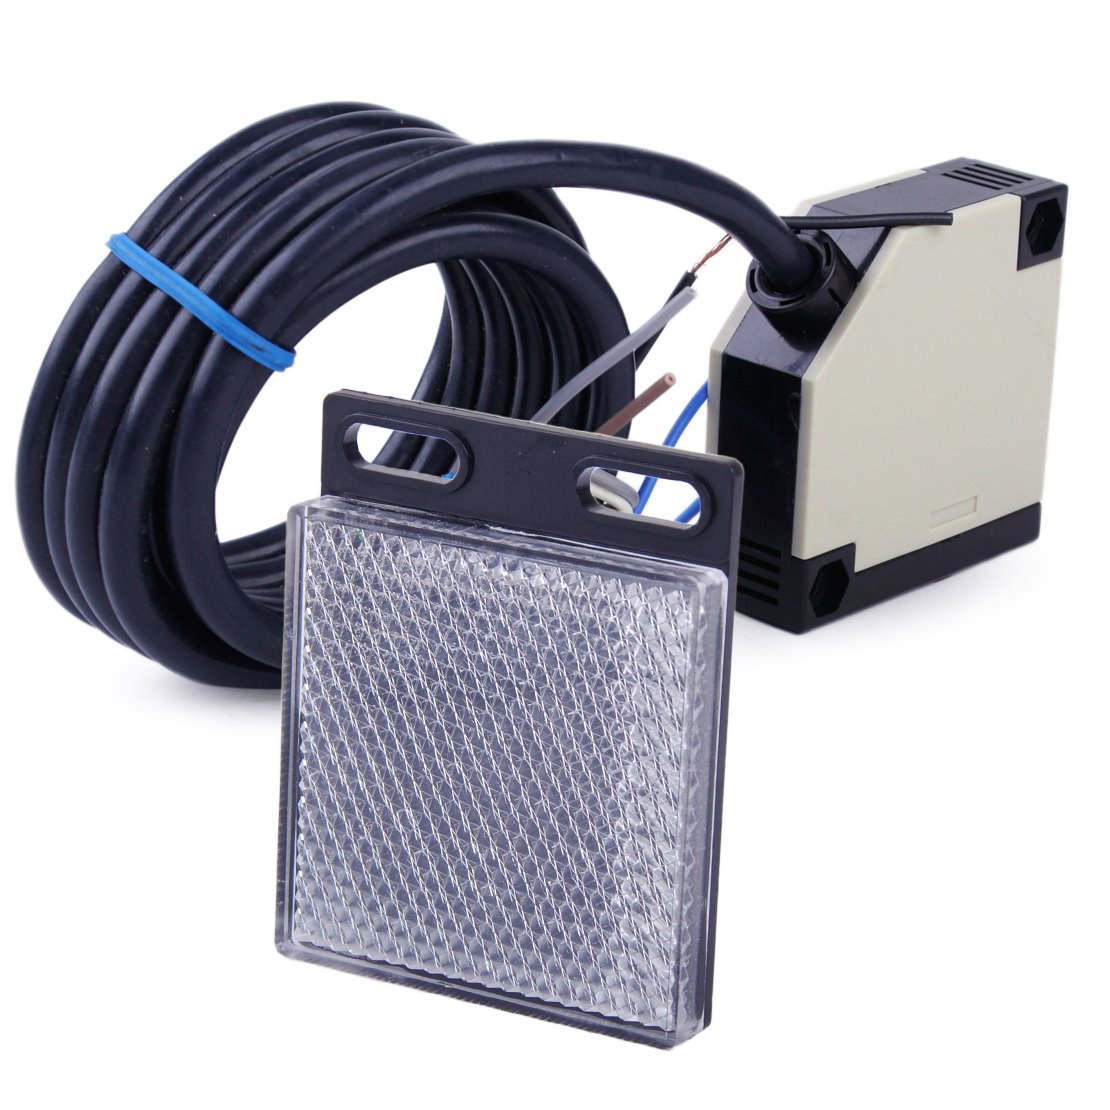 E3JK-R4M1  Lichtschranke Sensor Schalter 90-250VAC 12-240VAC//DC DC12-24V